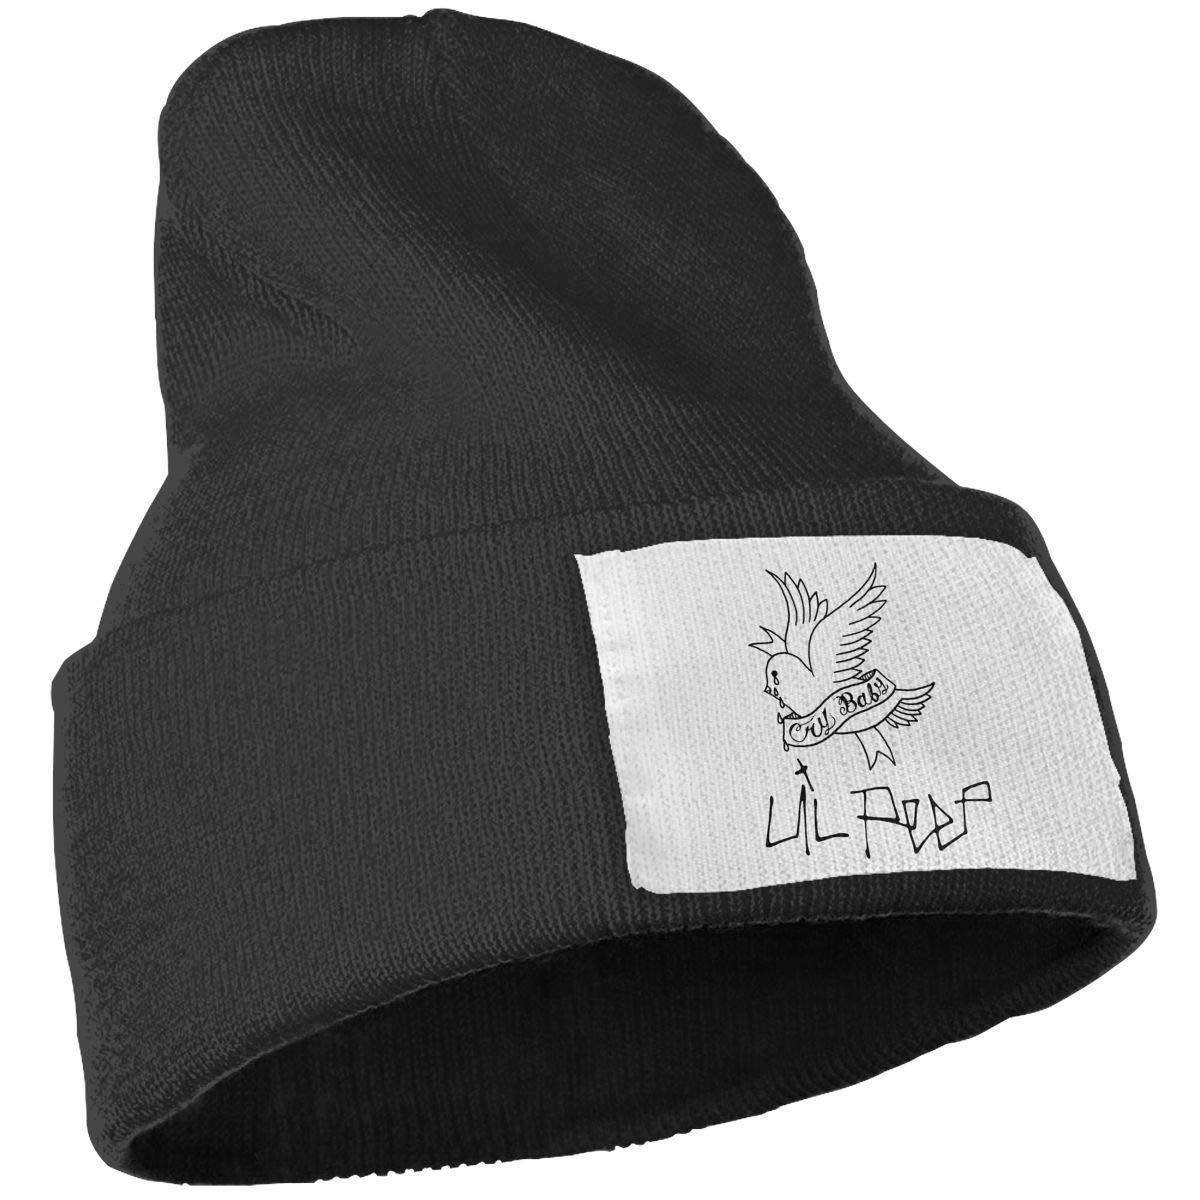 Unisex Winter Hats Lil Peep Letter Printed Skull Caps Knit Hat Cap Beanie Cap for Men//Womens